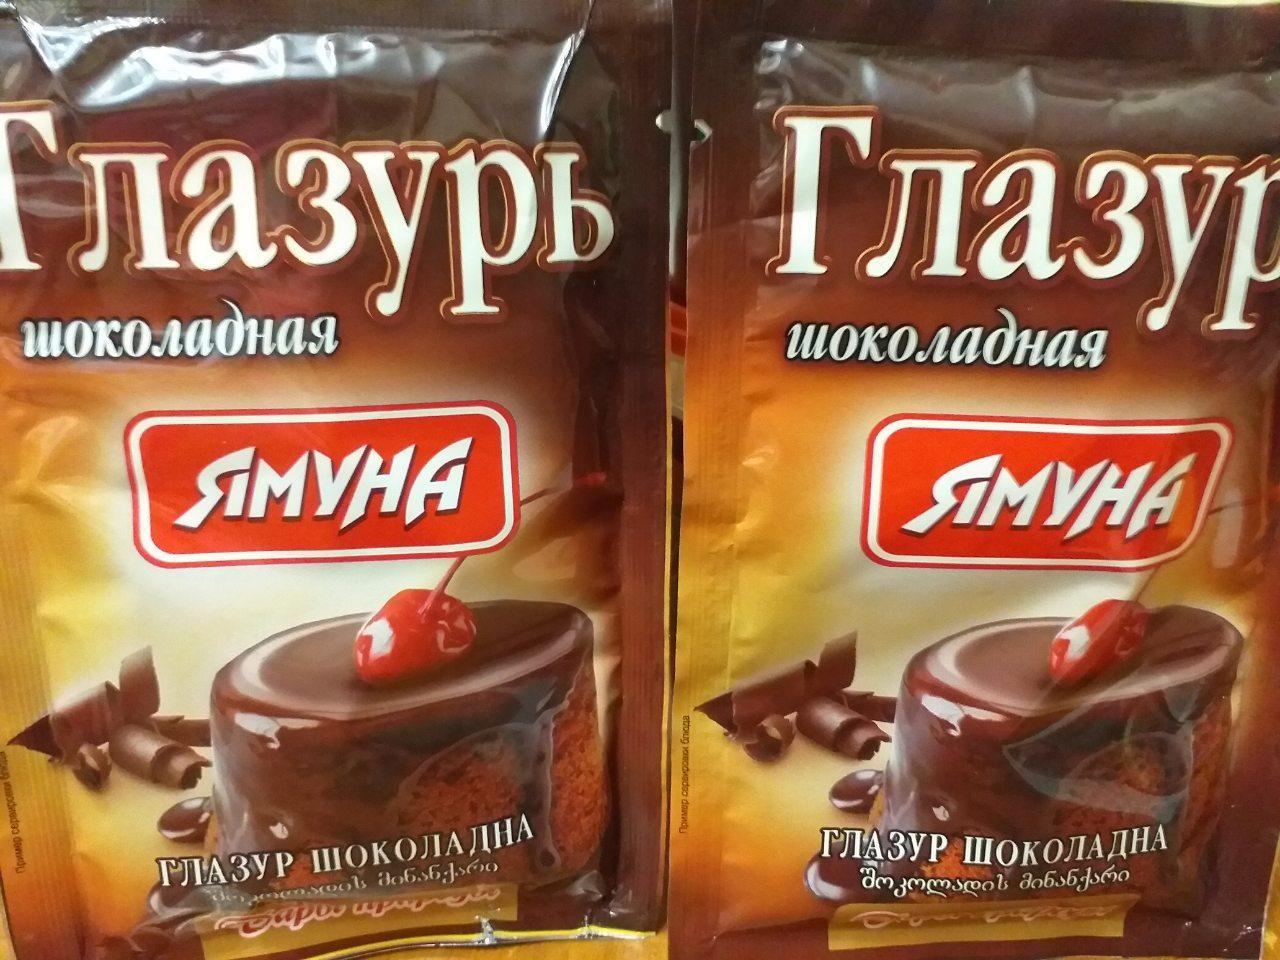 "Глазурь шоколадная  75 грамм ТМ Ямуна"""